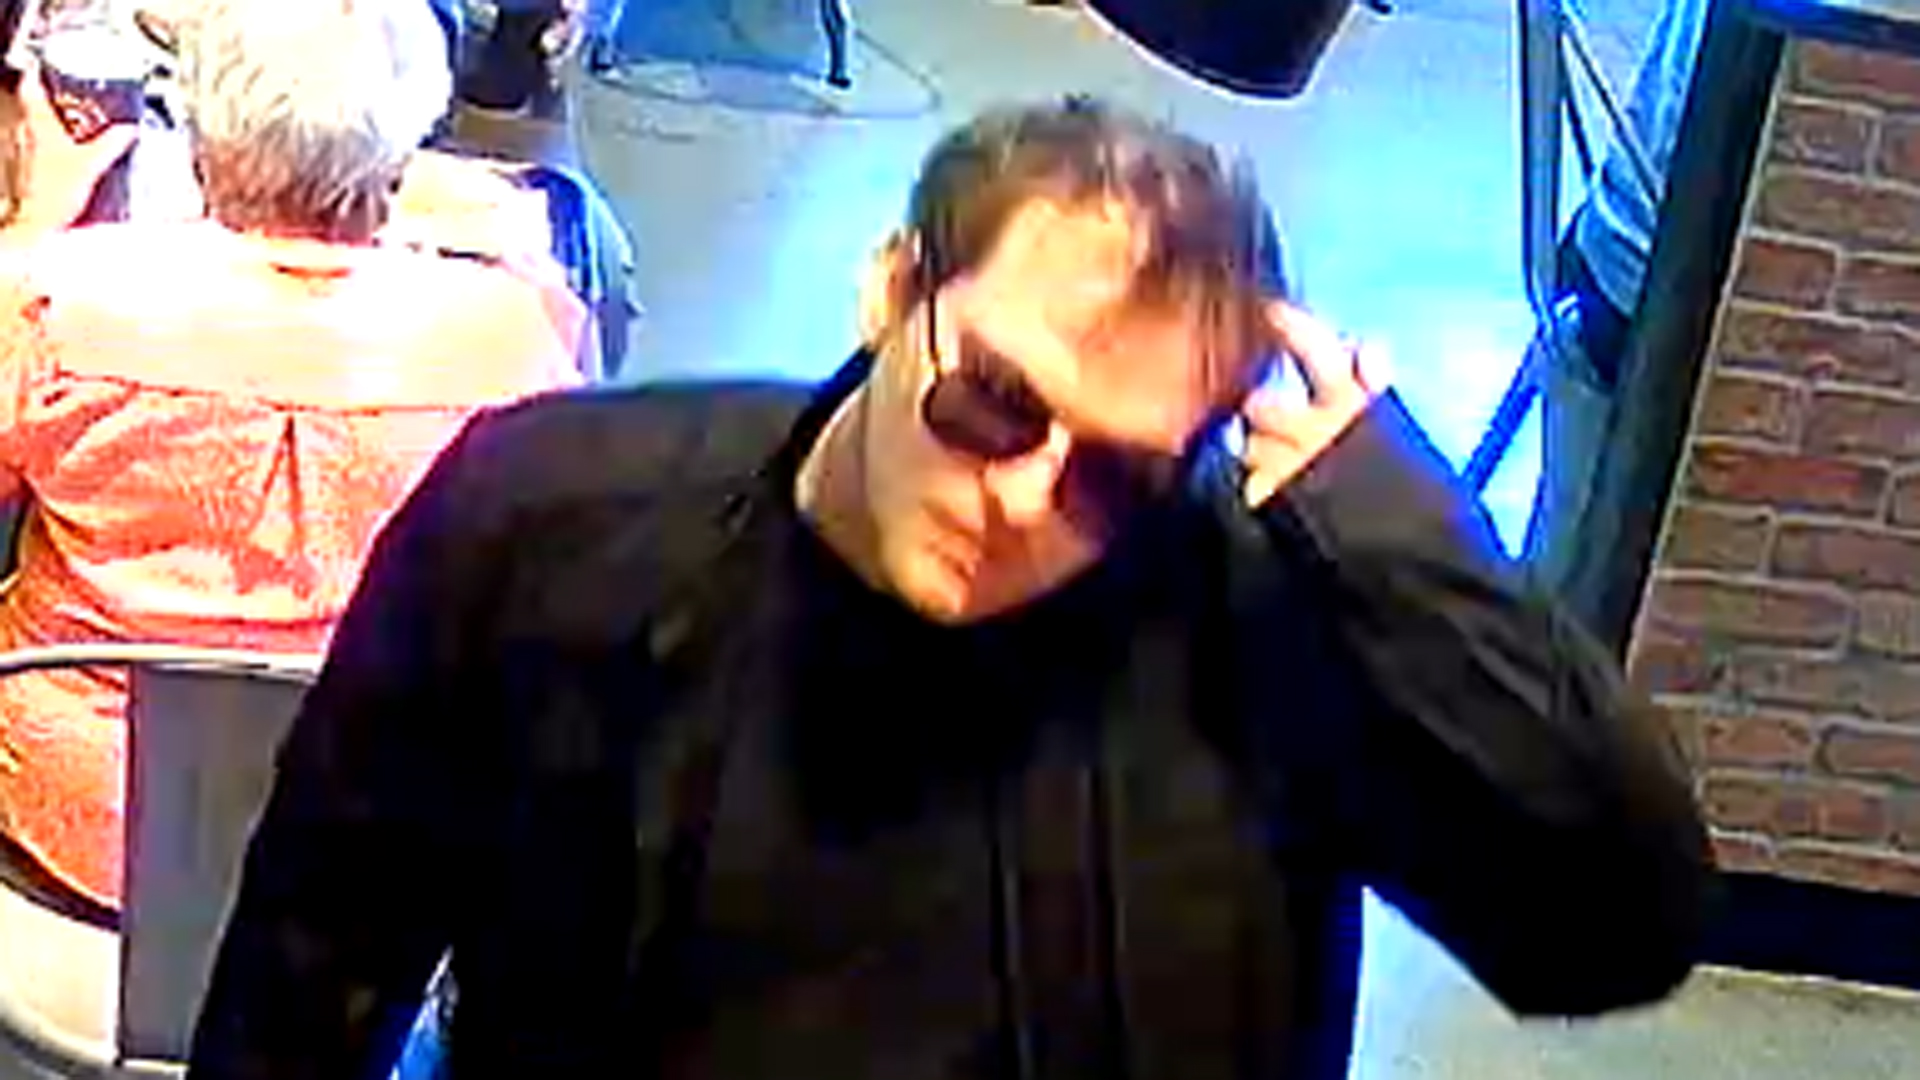 A man identified by San Luis Obispo police Skeeter Carlos Mangan is seen in a surveillance video still released by the agency on July 17, 2019.